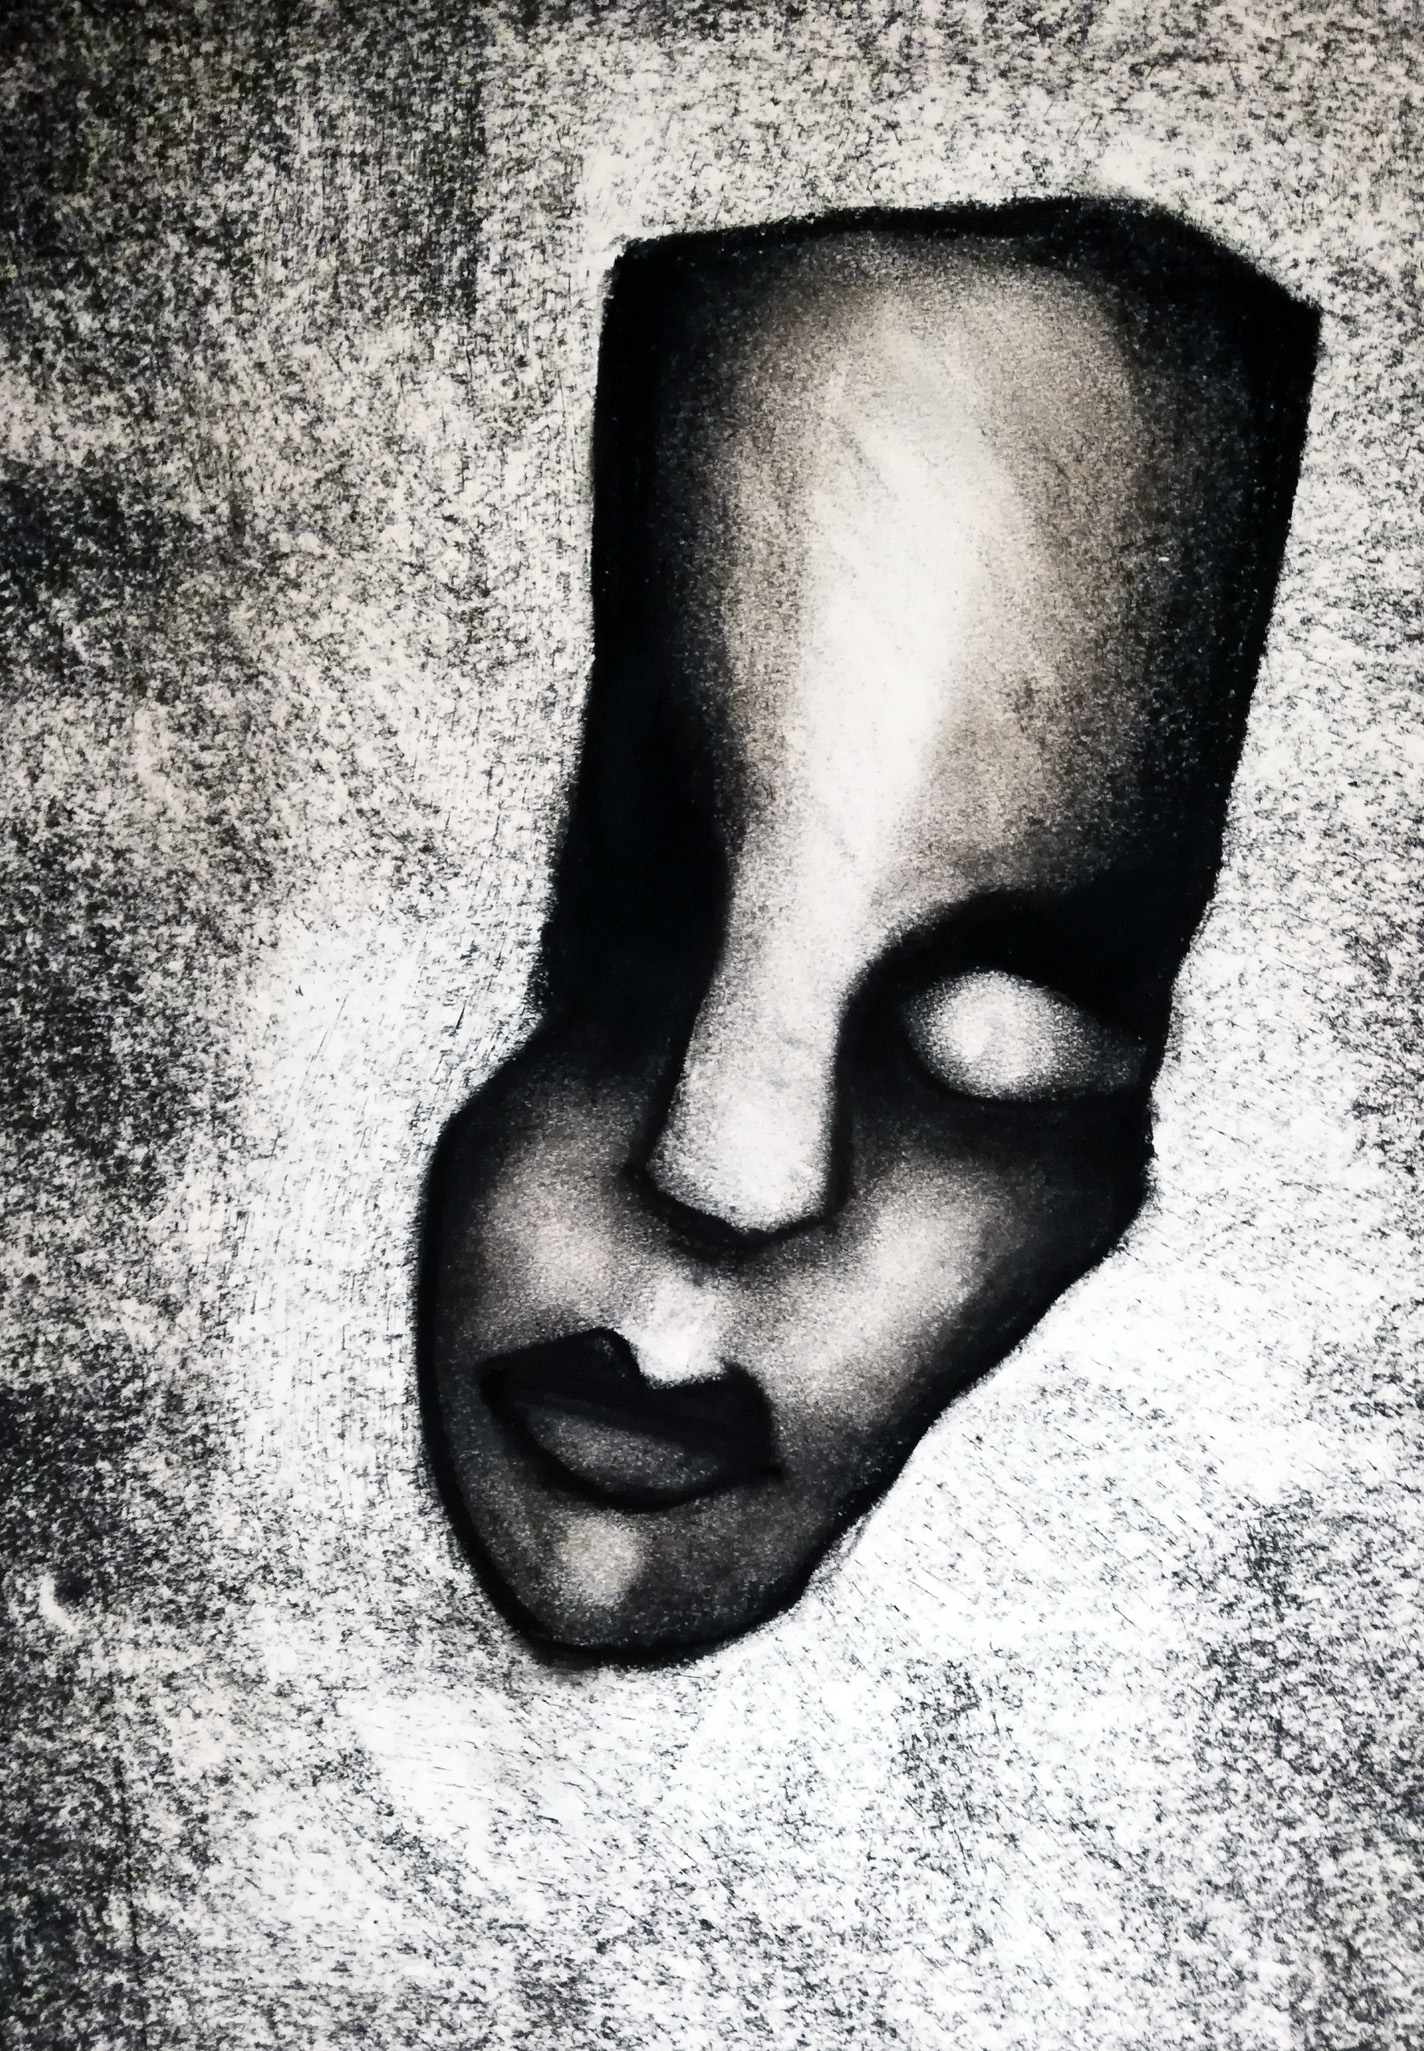 Artwork of a face